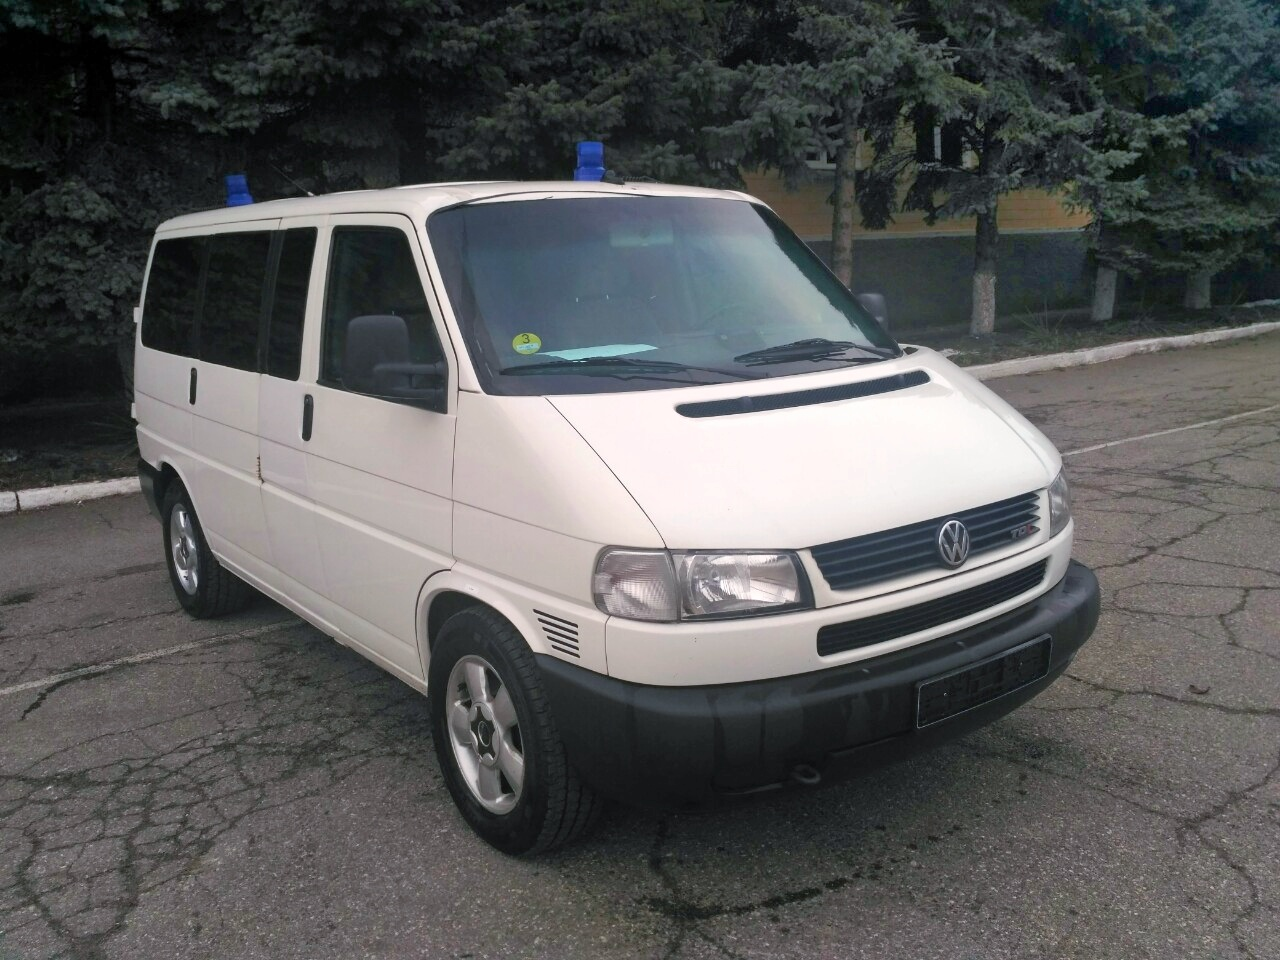 Sistemul penitenciar a primit un automobil de la Ambasada Republicii Federale Germane